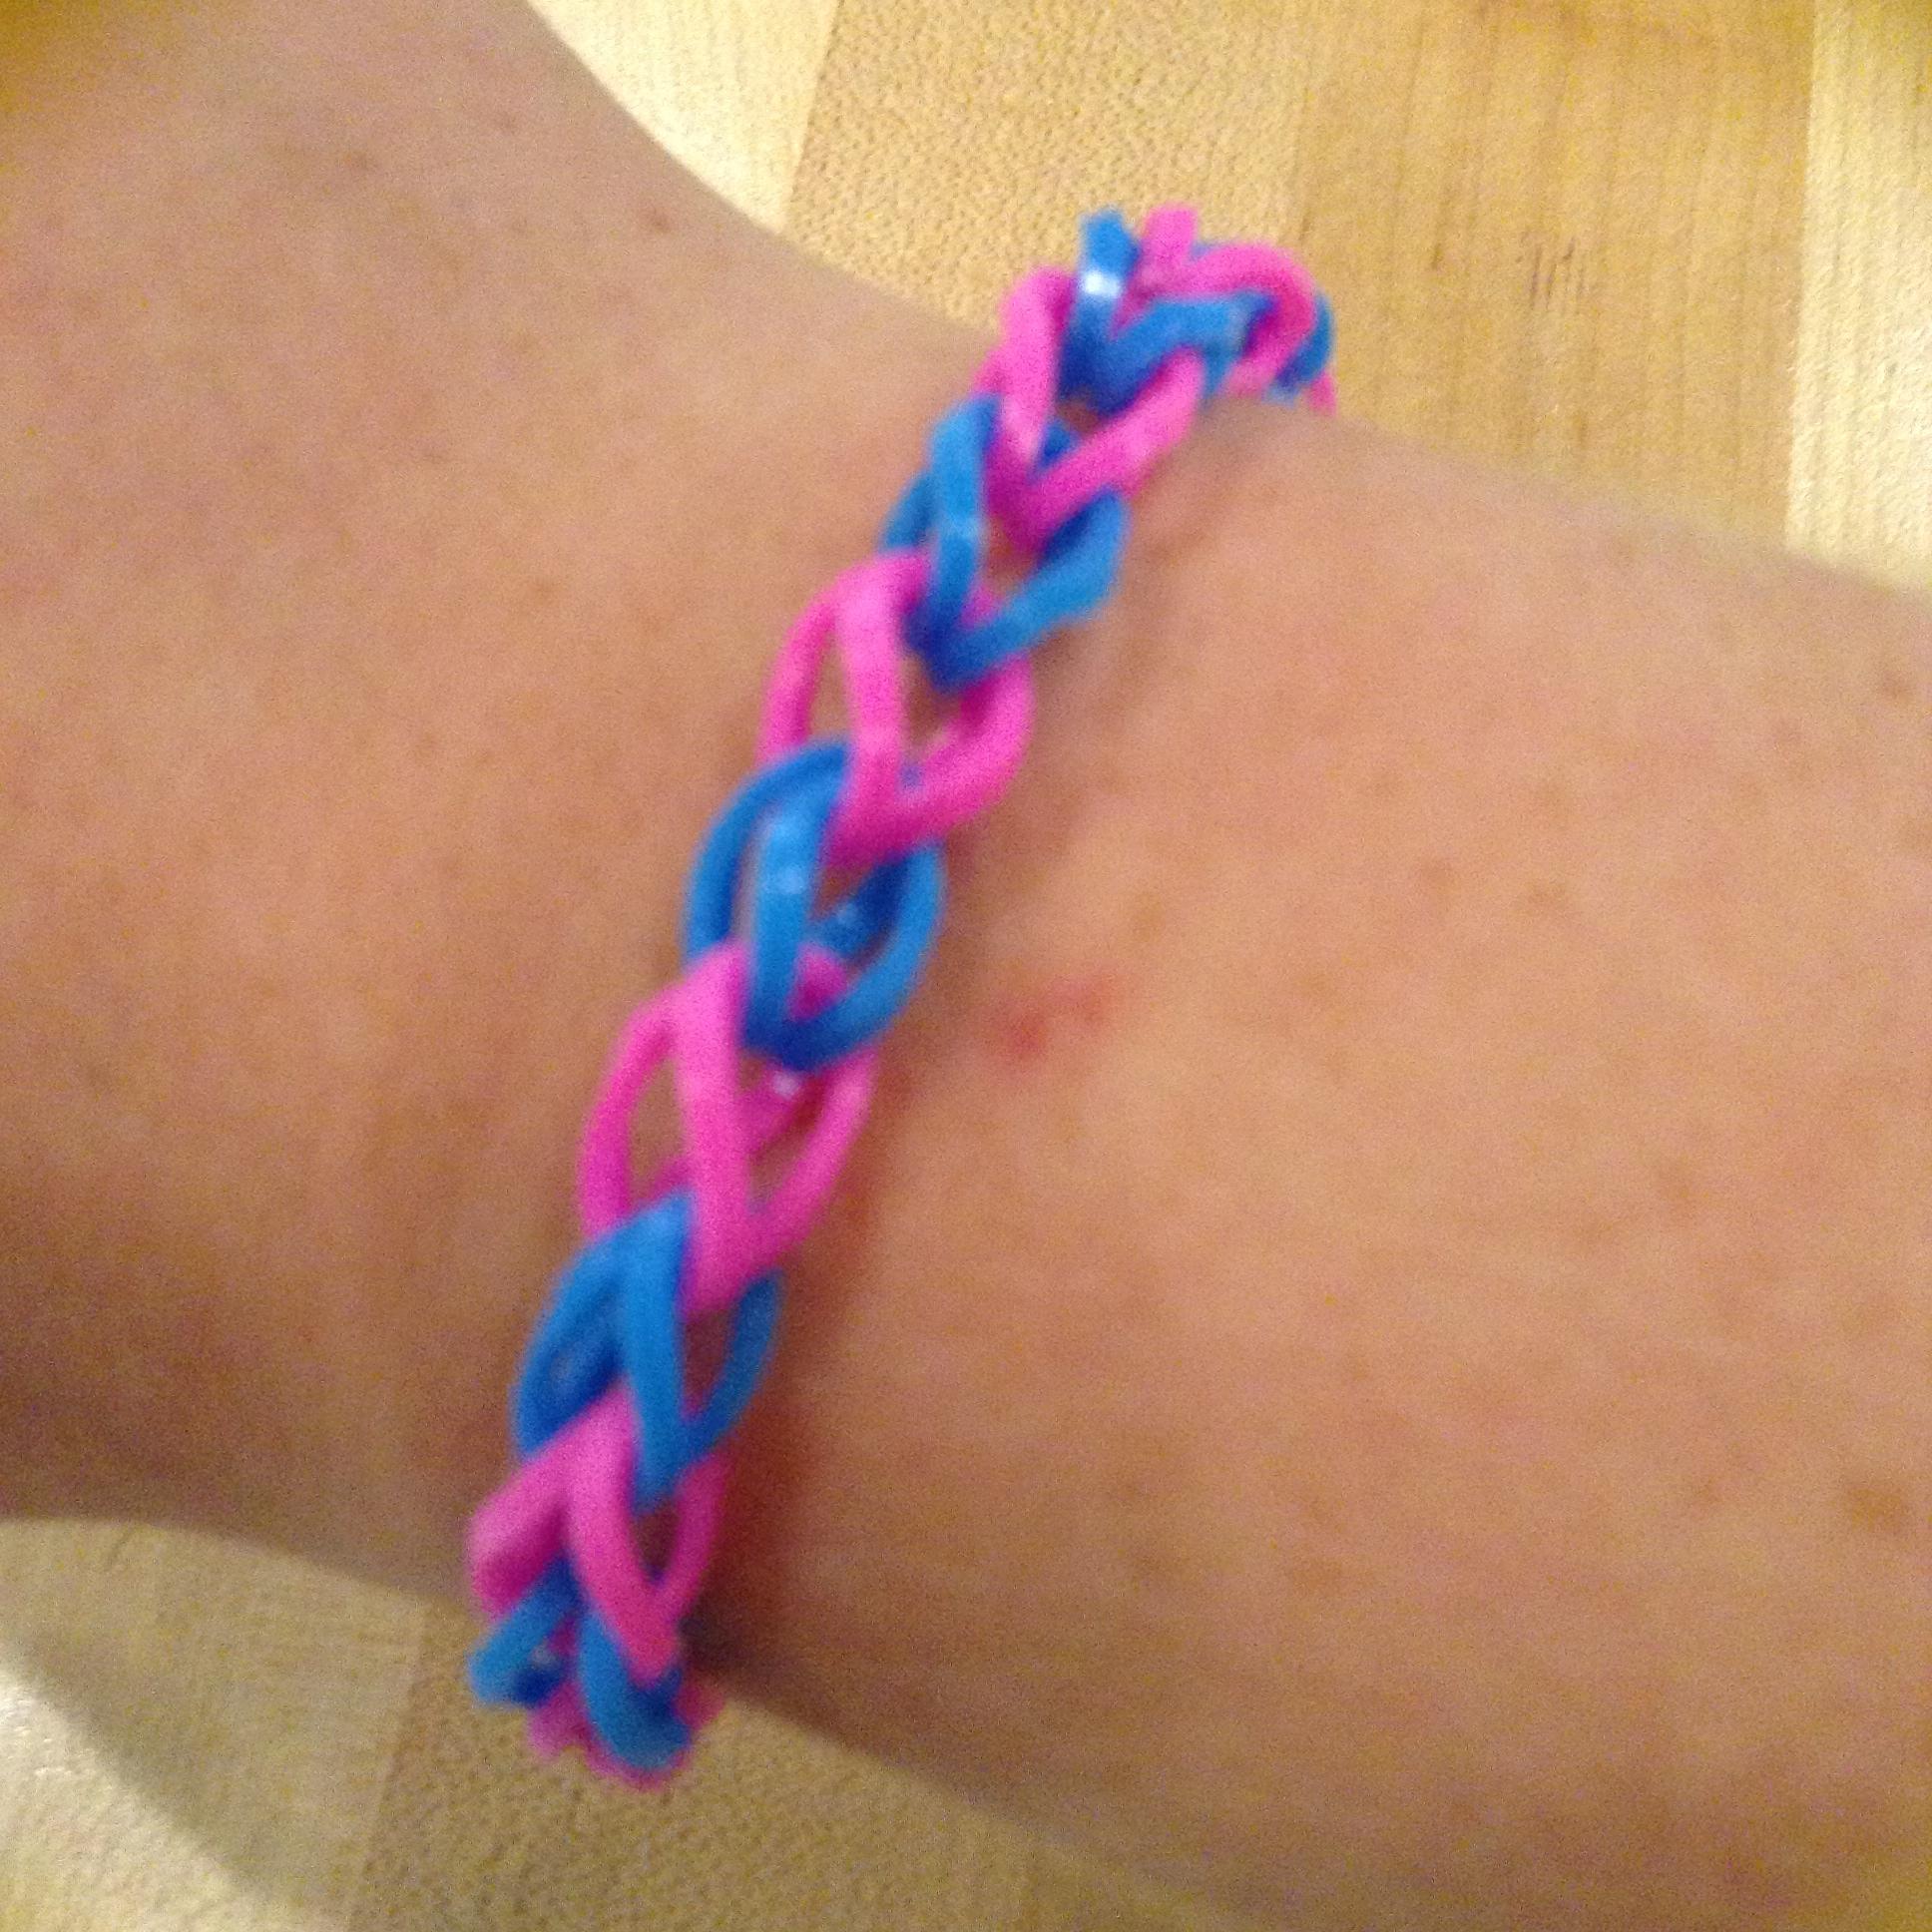 how to make a regular rubber band bracelet